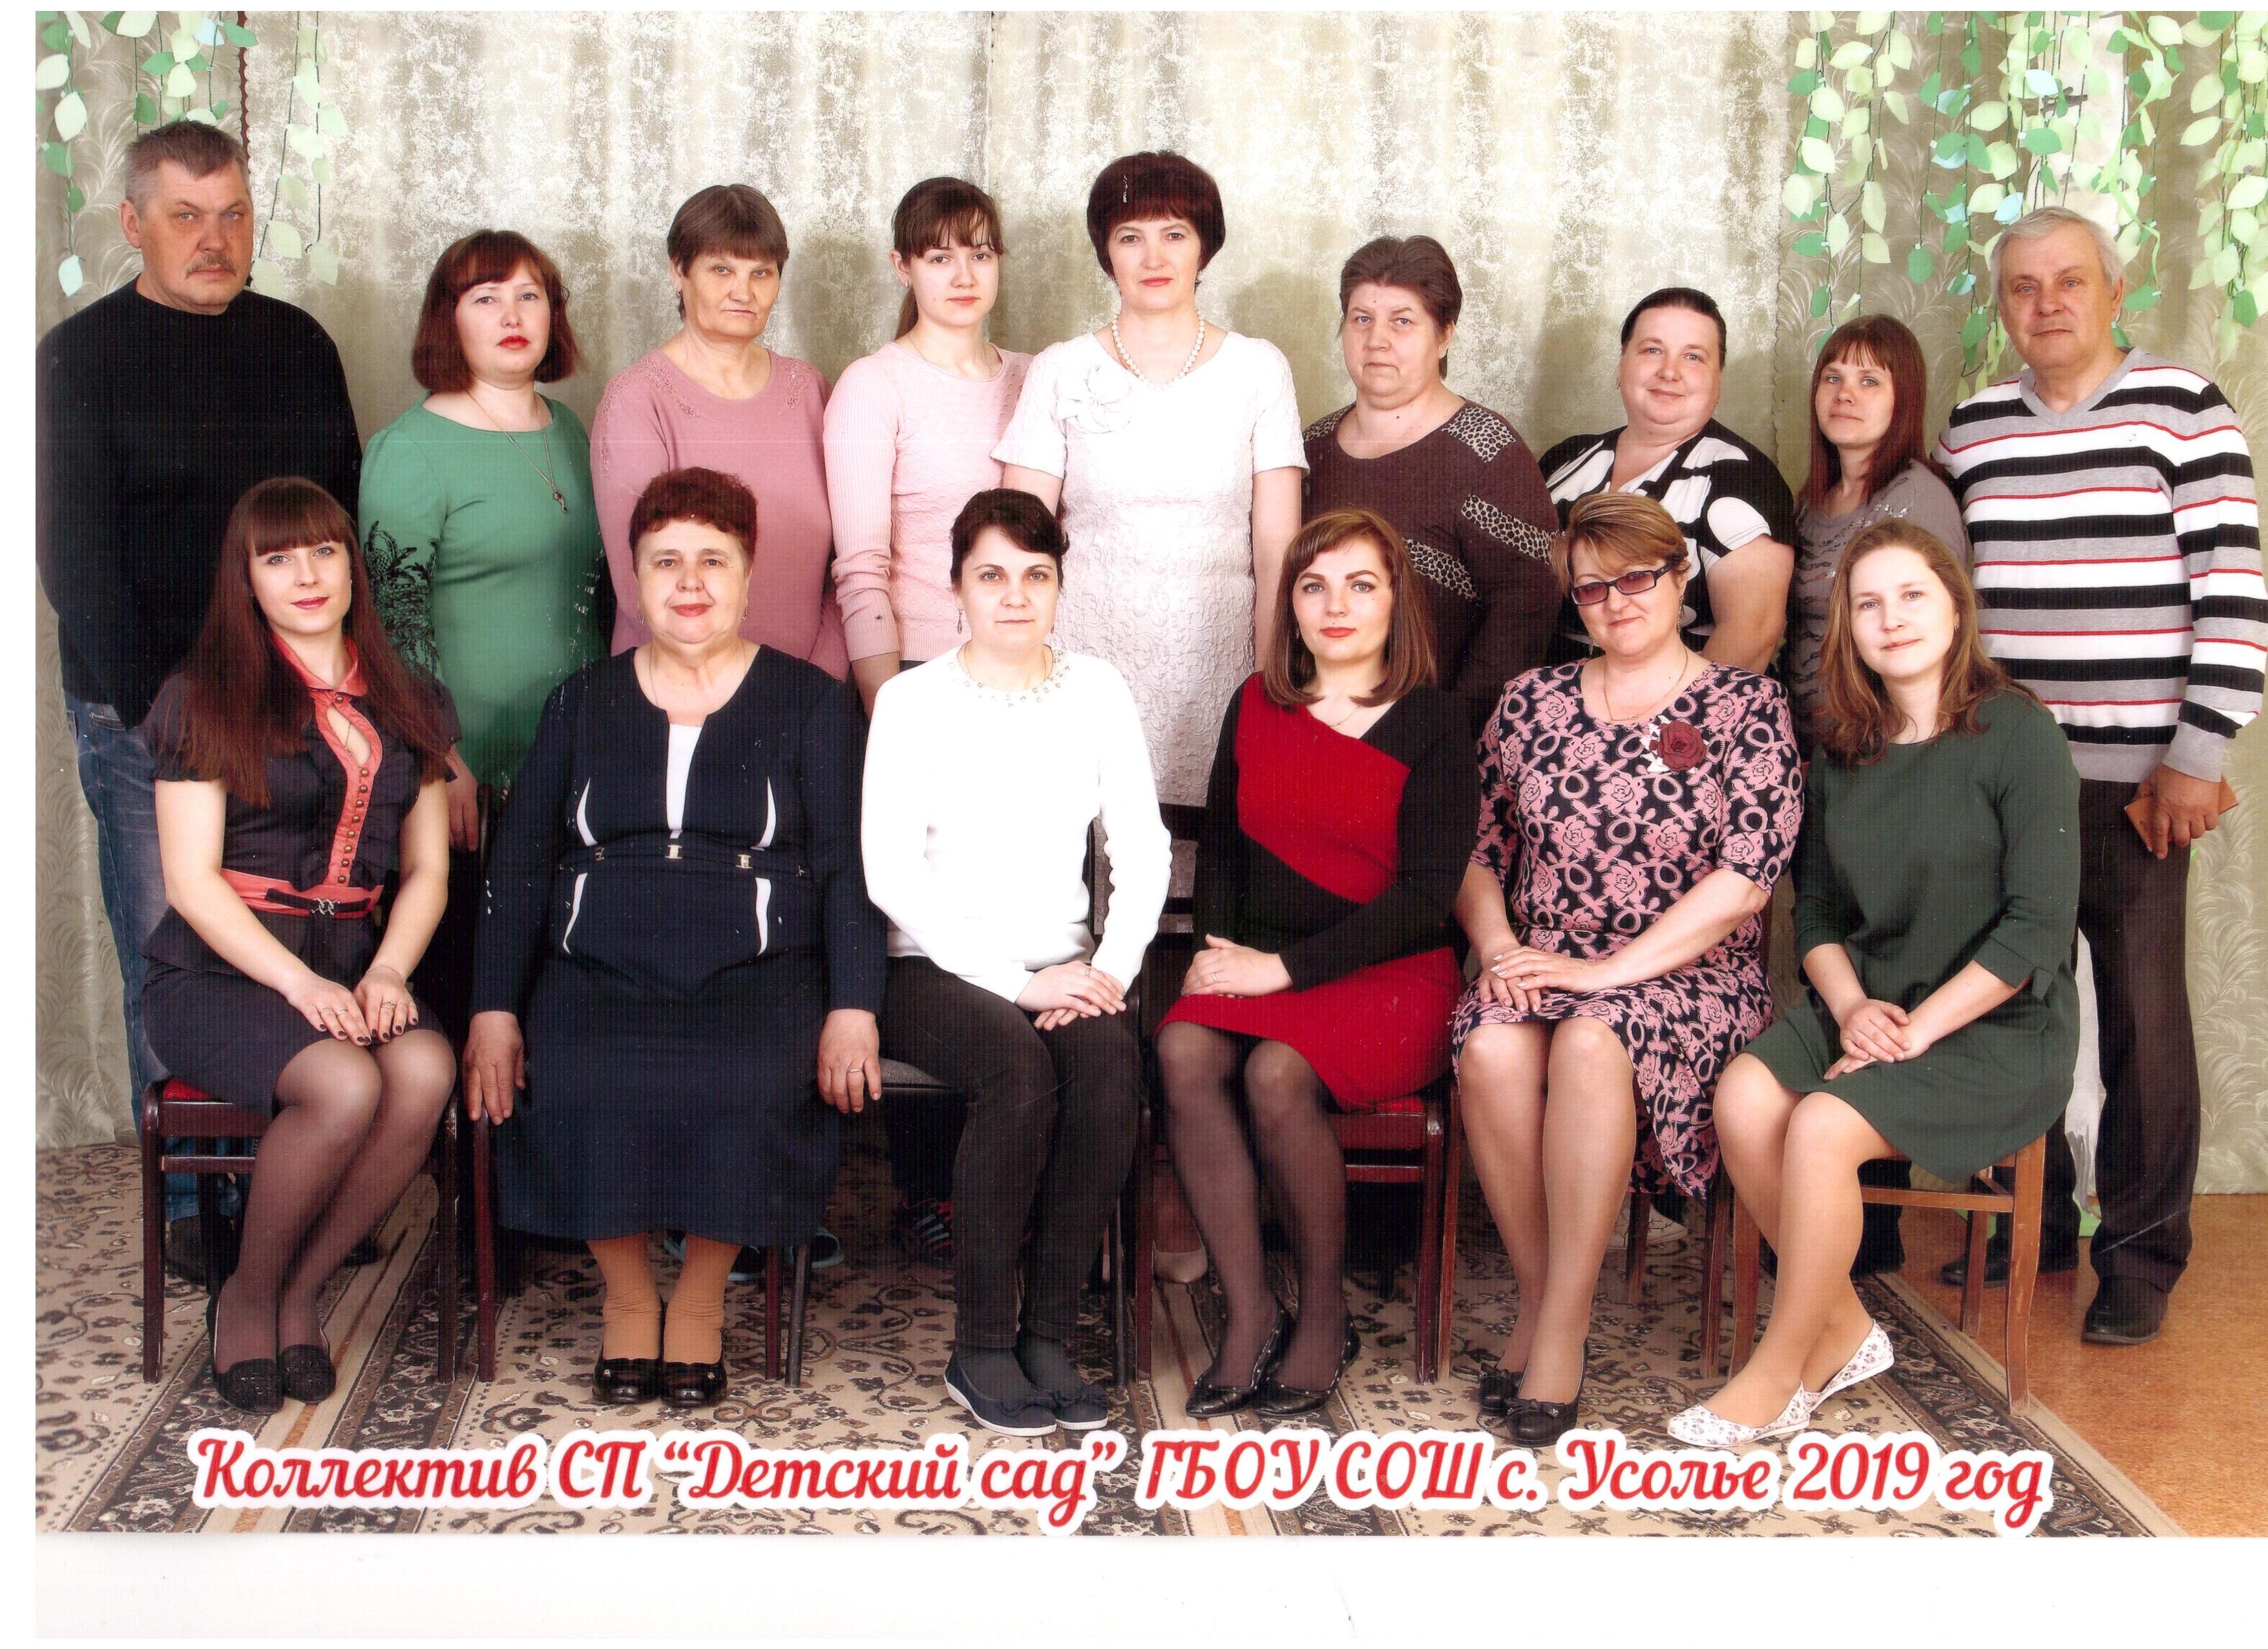 FOTO KOLLEKTIV g